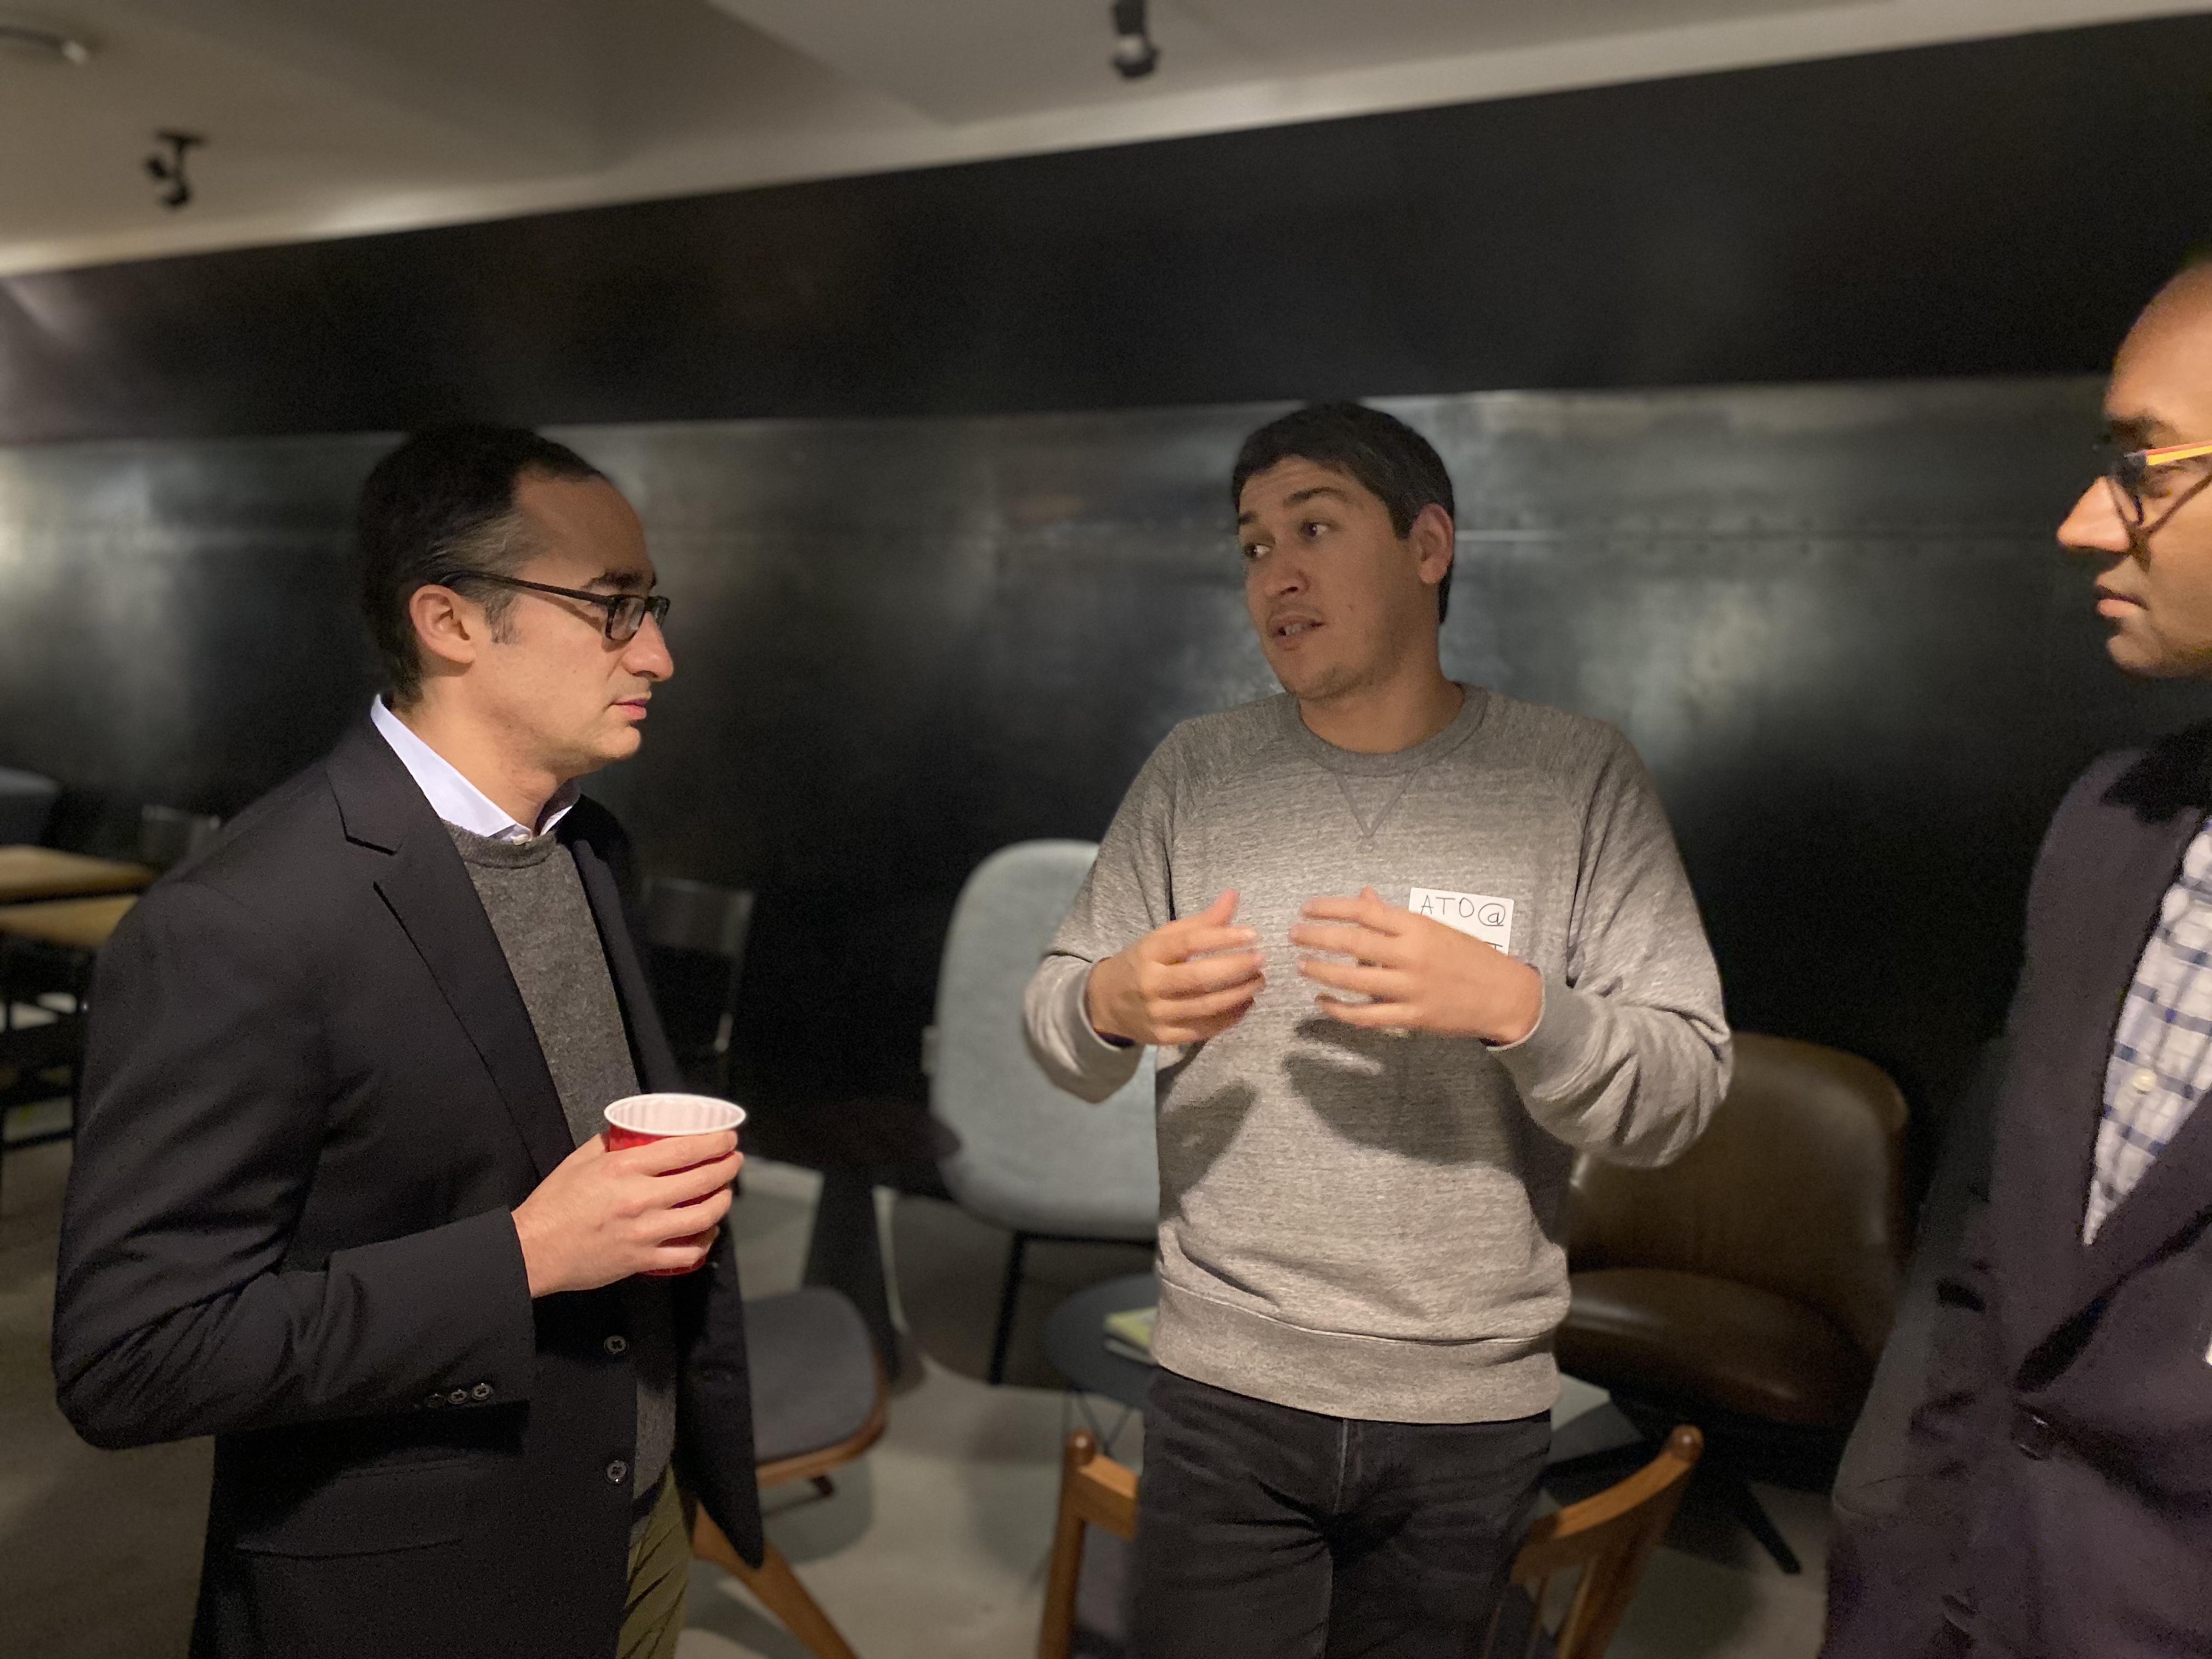 Paubox + Zentist 2020 Social Mixer (pics): Roger Cohen & Ato Kasymov